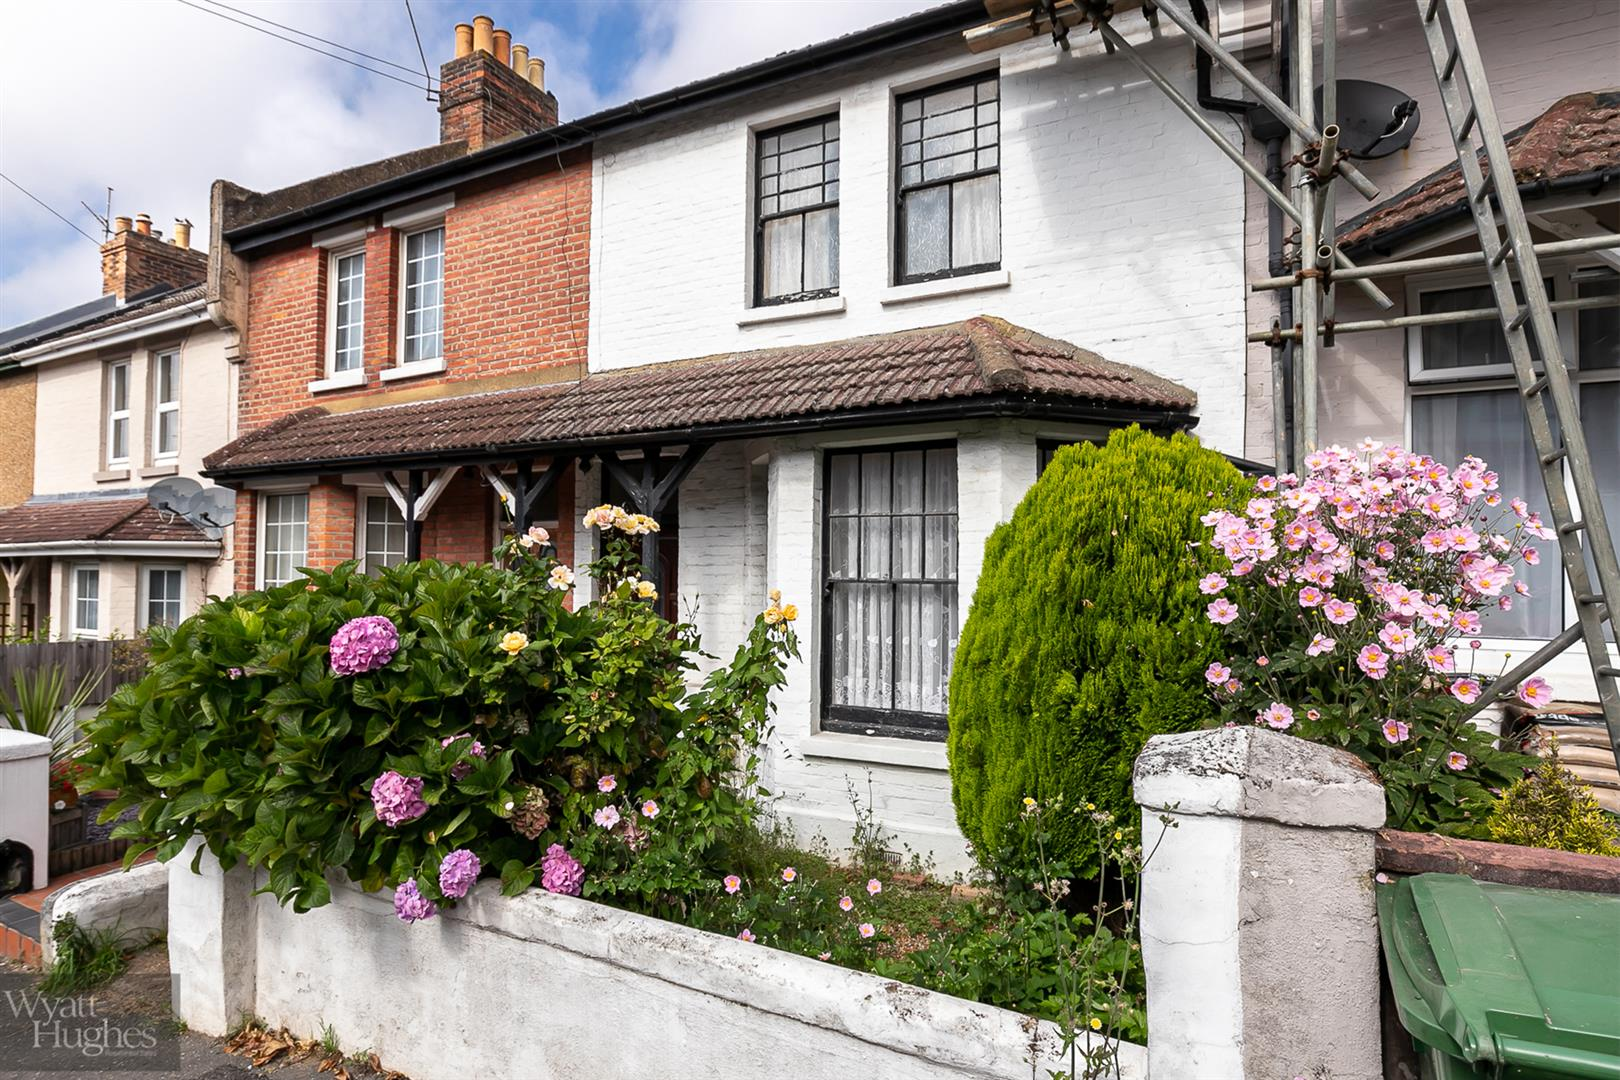 2 bed terraced house for sale in Paynton Road, St. Leonards-On-Sea, TN37